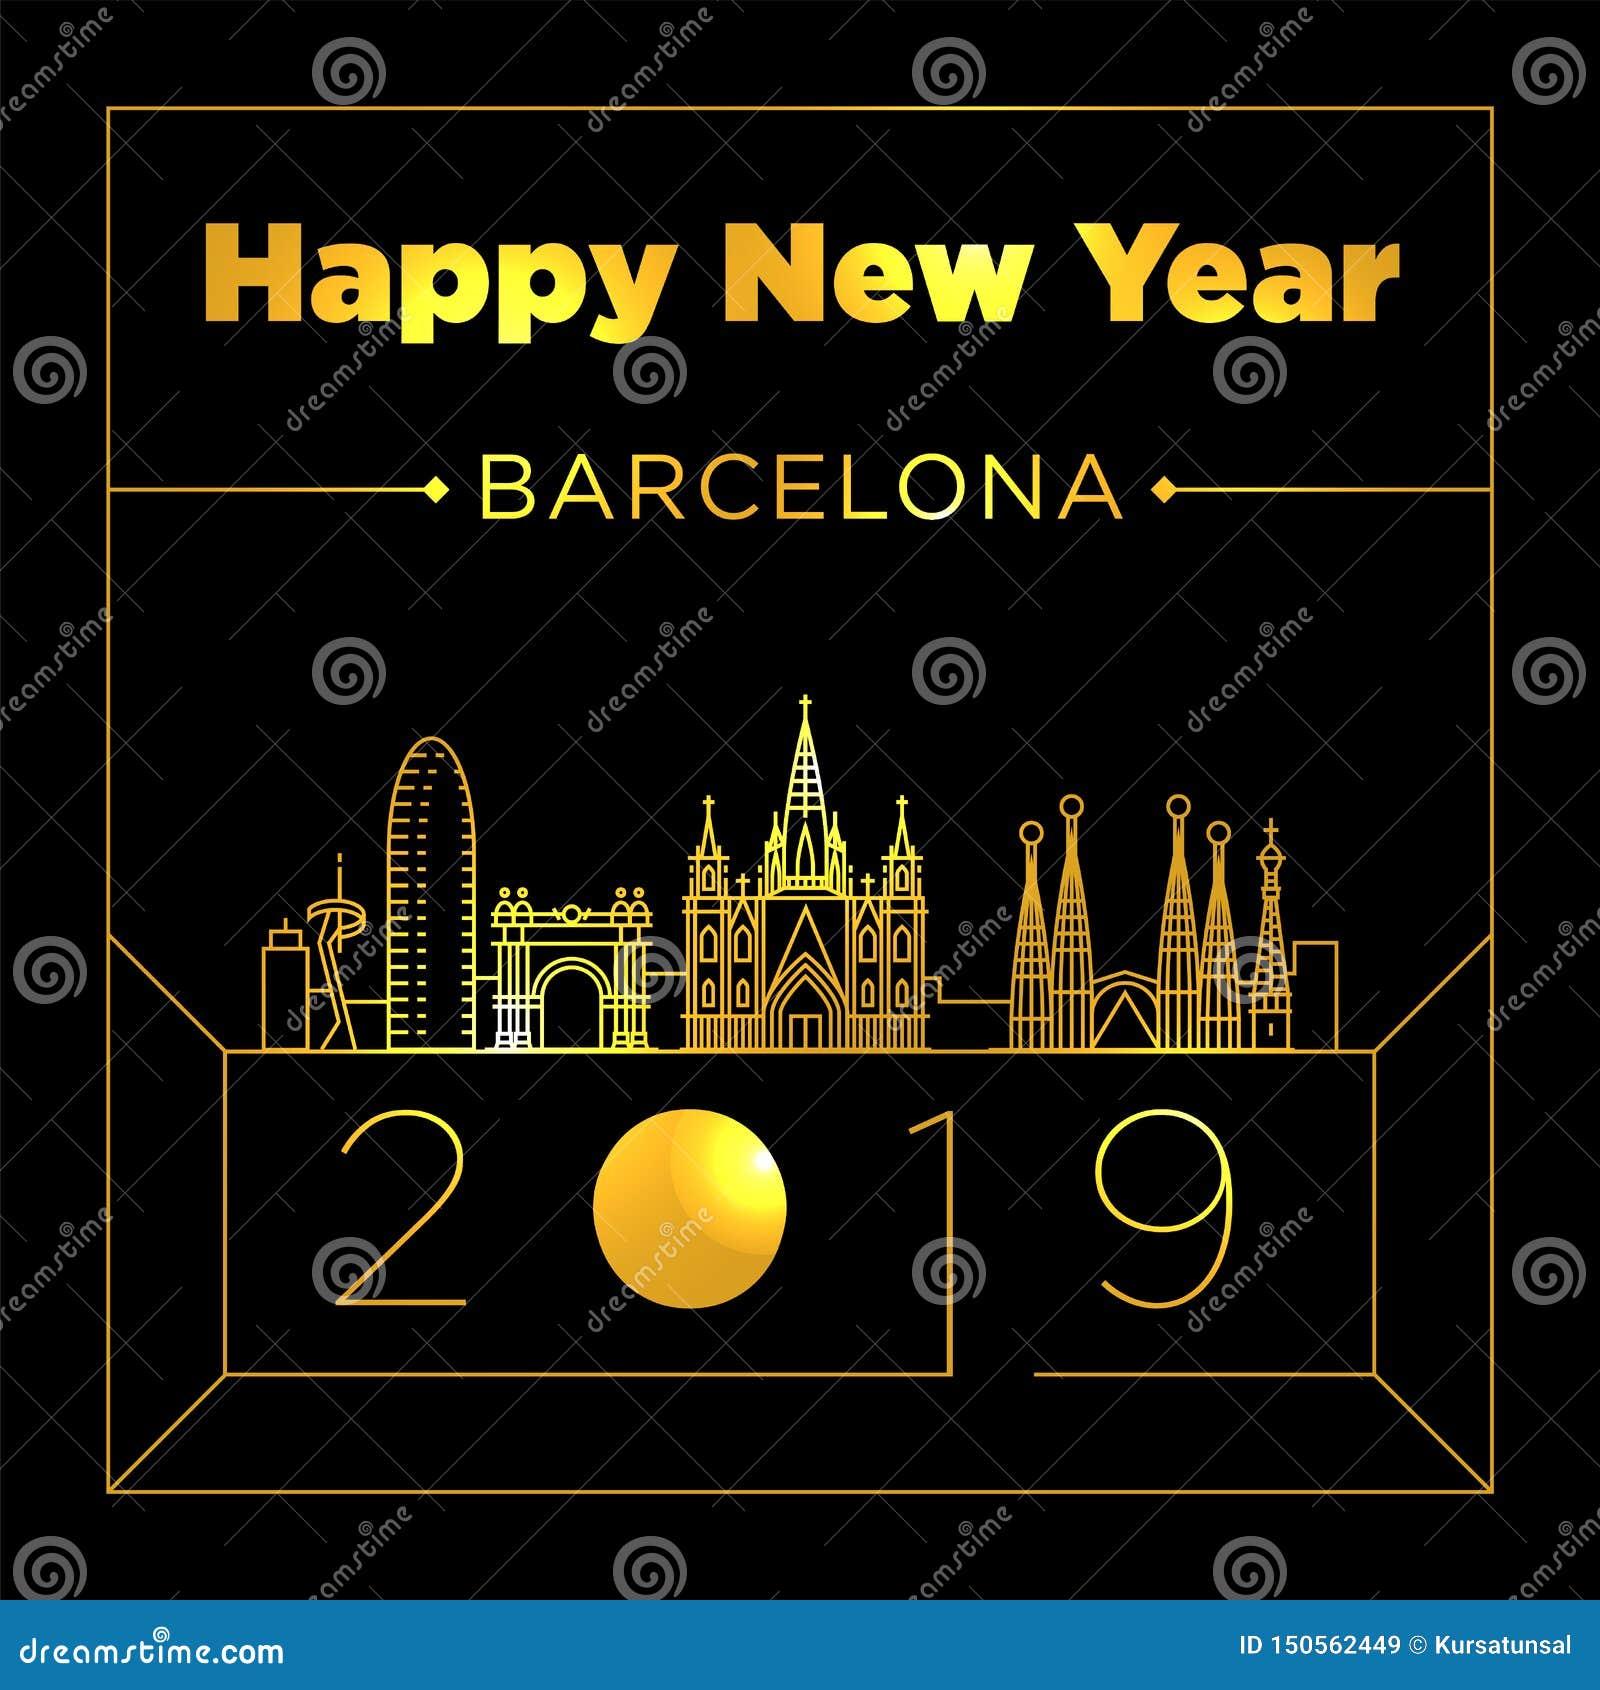 Barcelona City New Year Card Design Template Stock ...